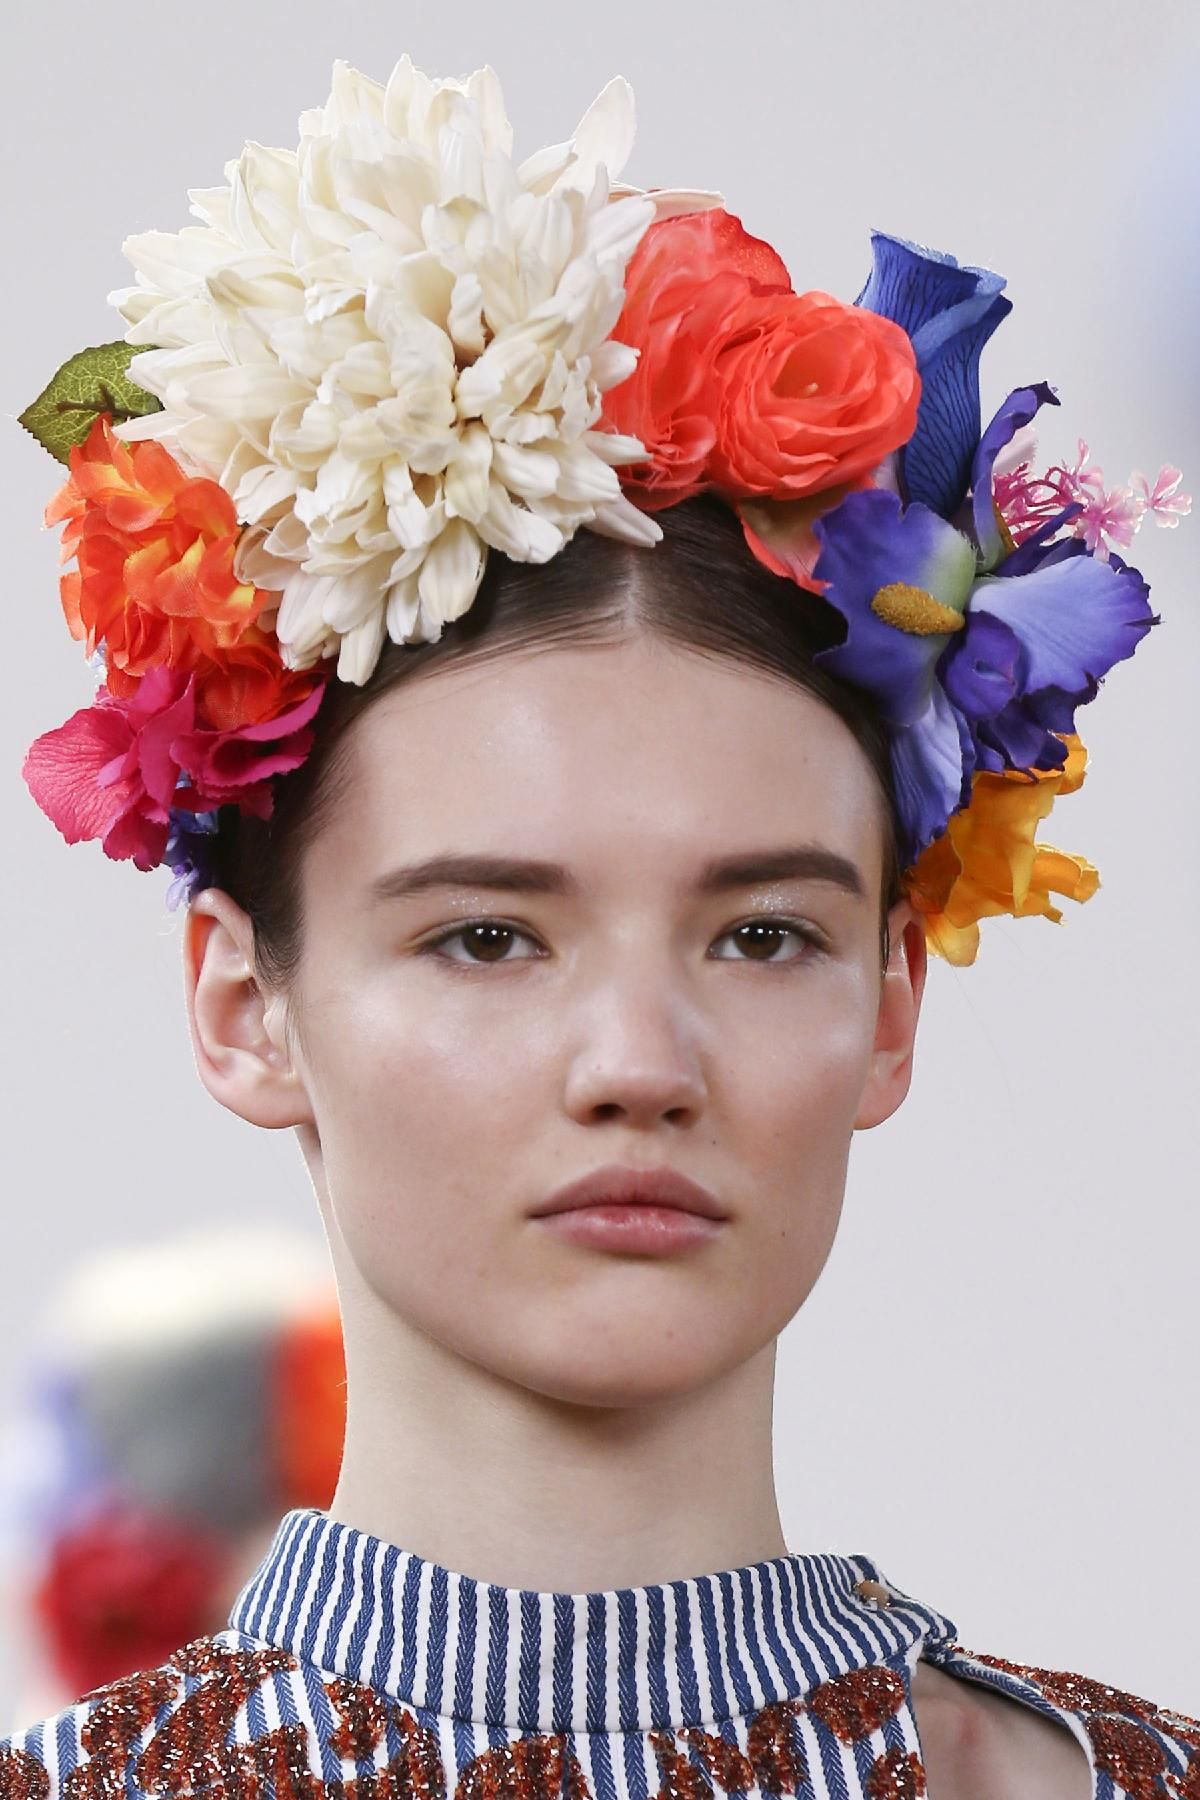 Eudon choi fall 2013 rtw fashion show fall flower hair wreaths eudon choi fall 2013 rtw fashion show flower fashionflower crownsflower izmirmasajfo